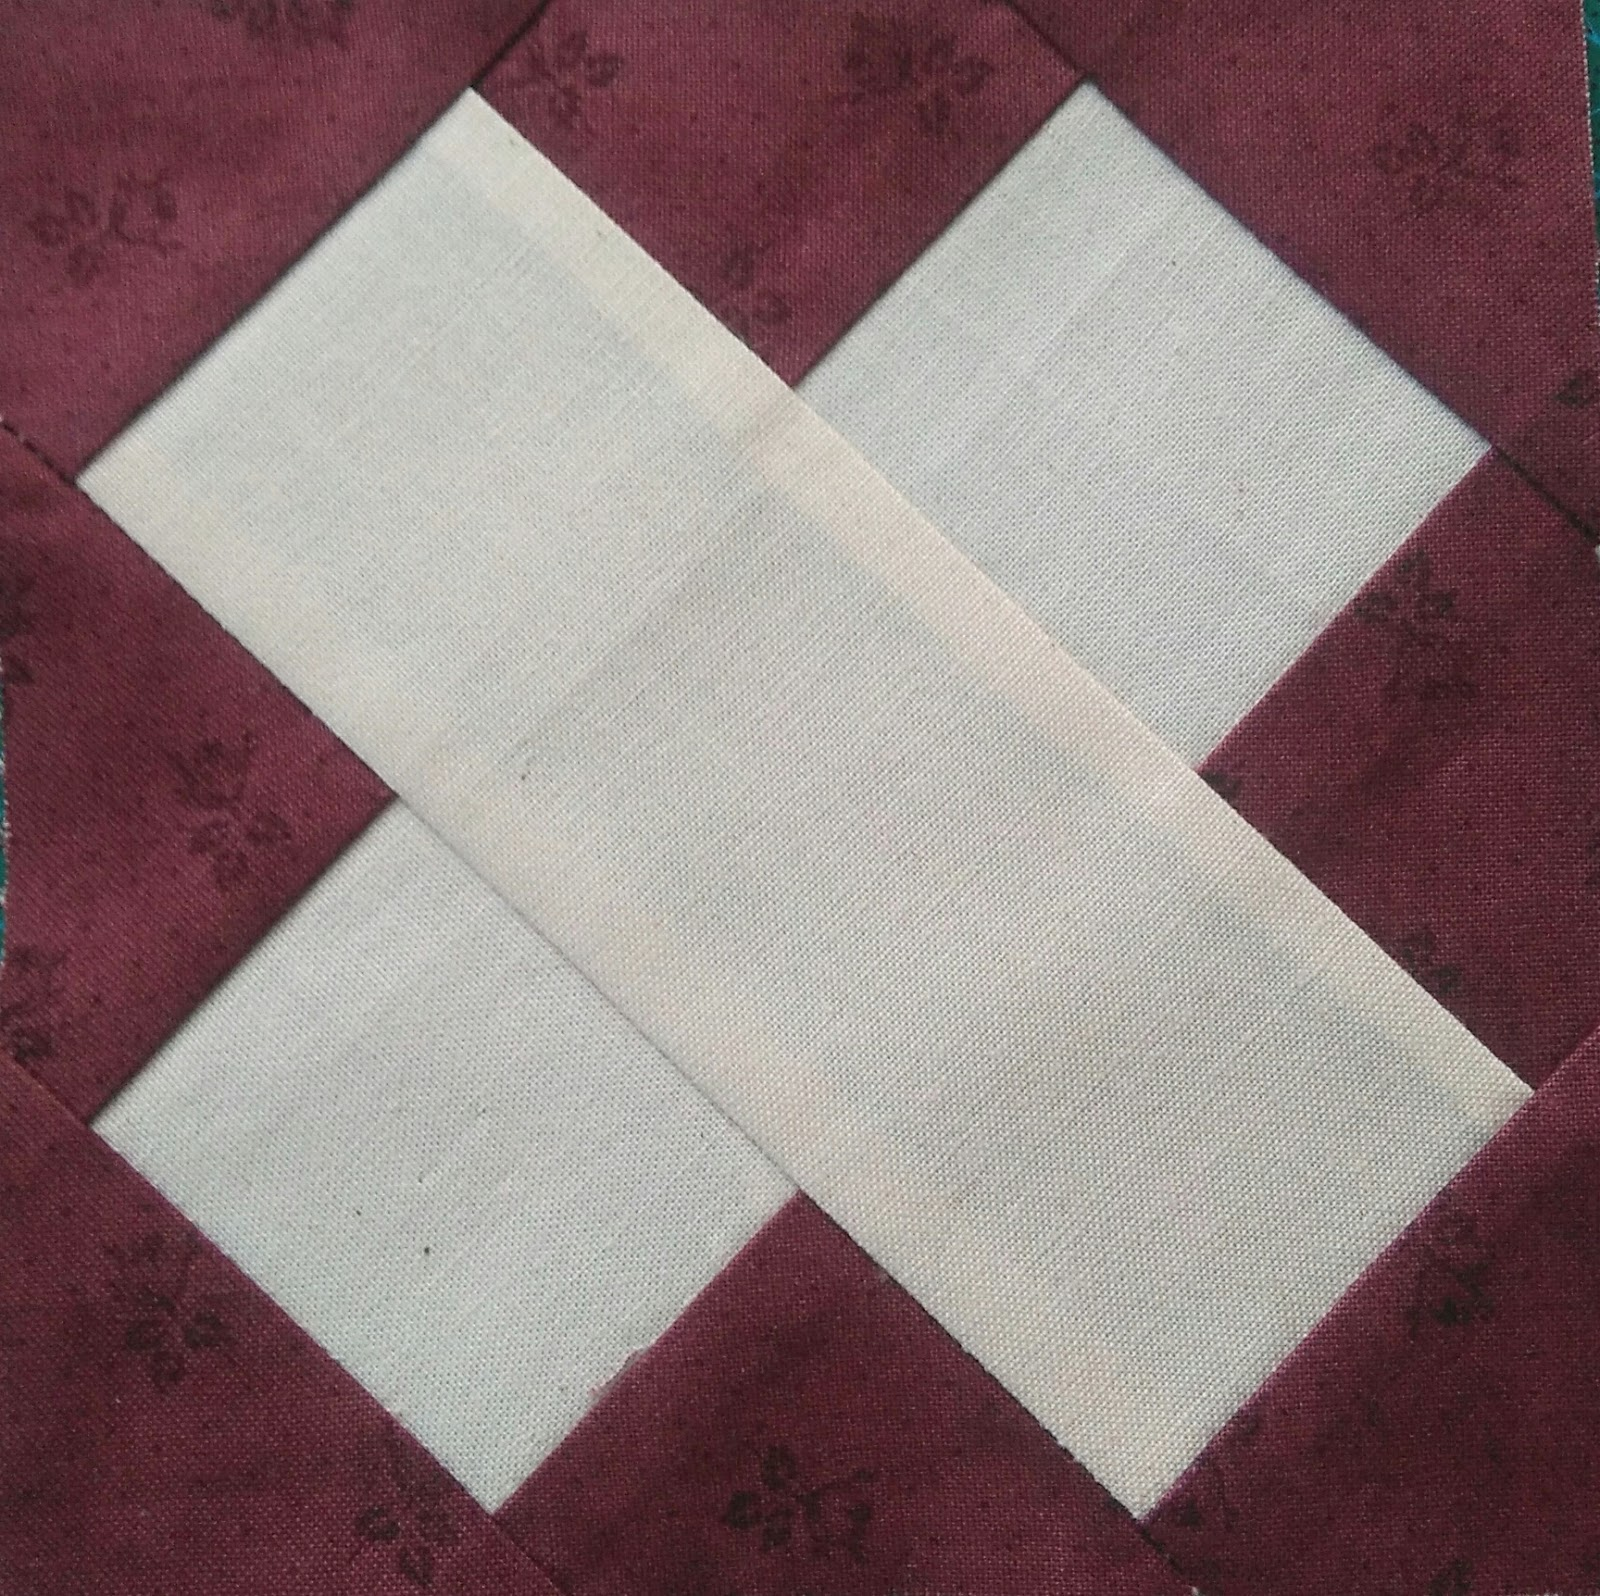 Florence Nightingale Craft Activities Ks